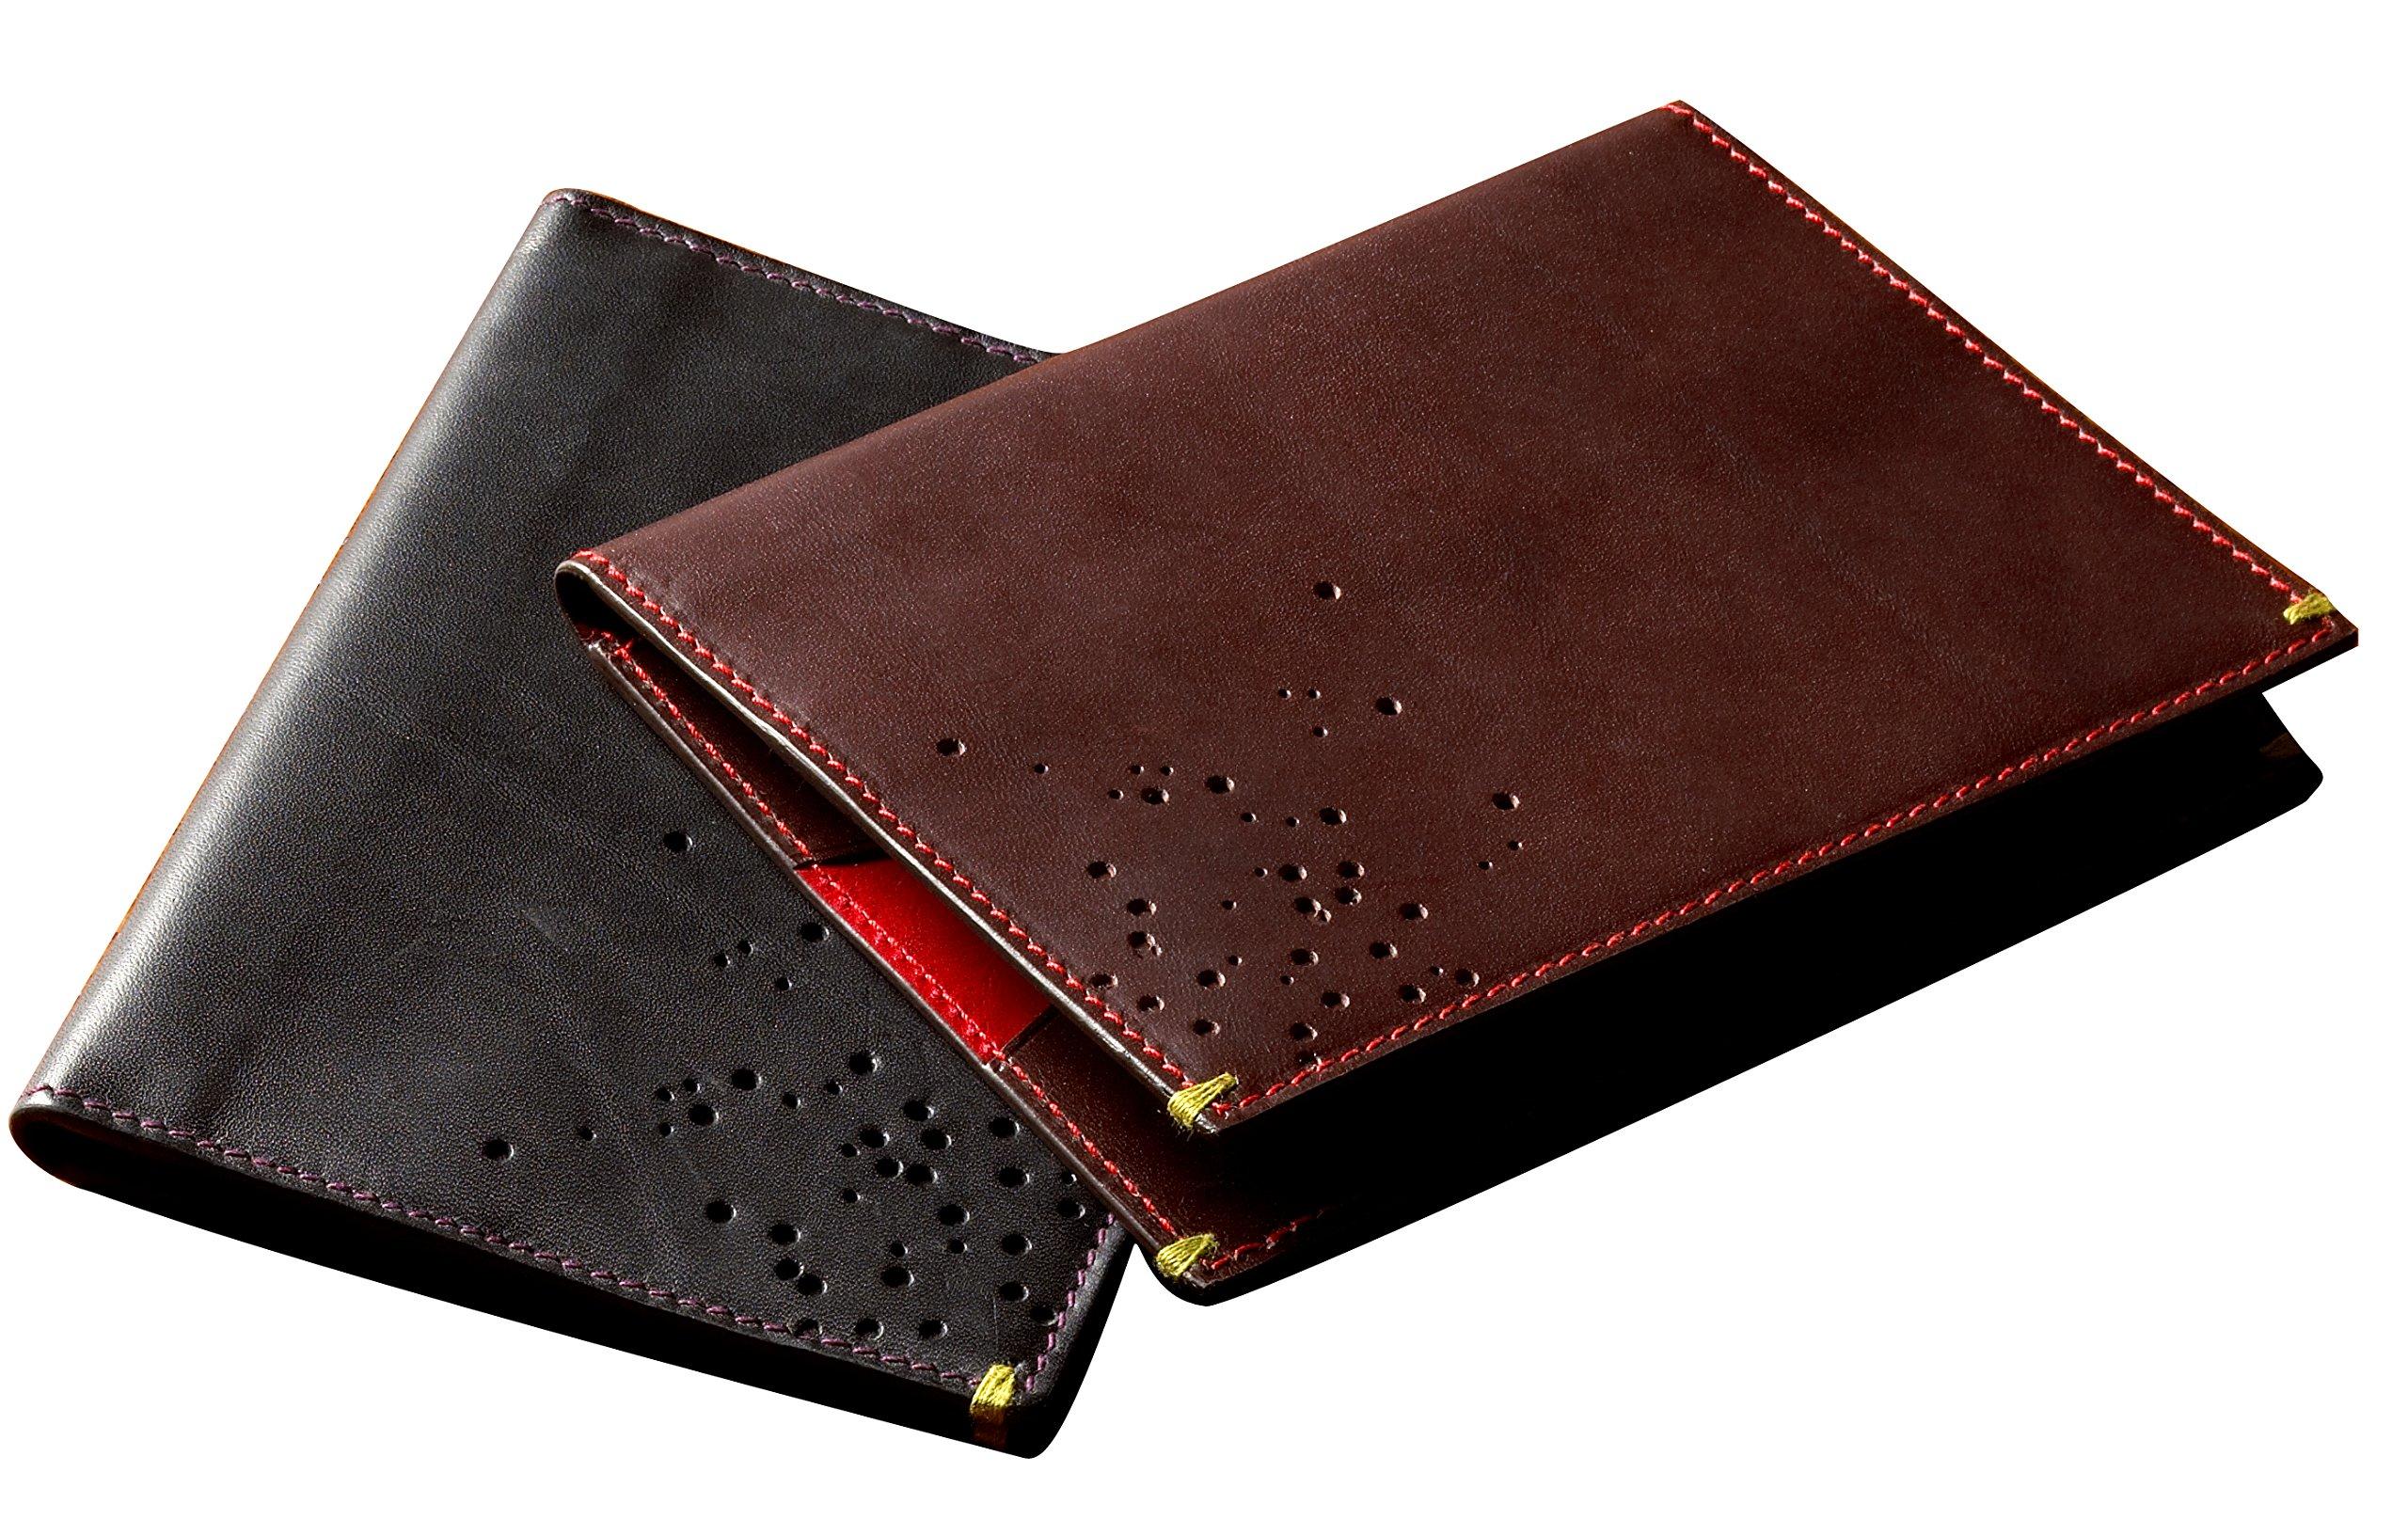 Passport Wallet Travel Folio by Güs in Splitshot Saddle Leather | Made in Italy (Brown Splitshot Perforated)